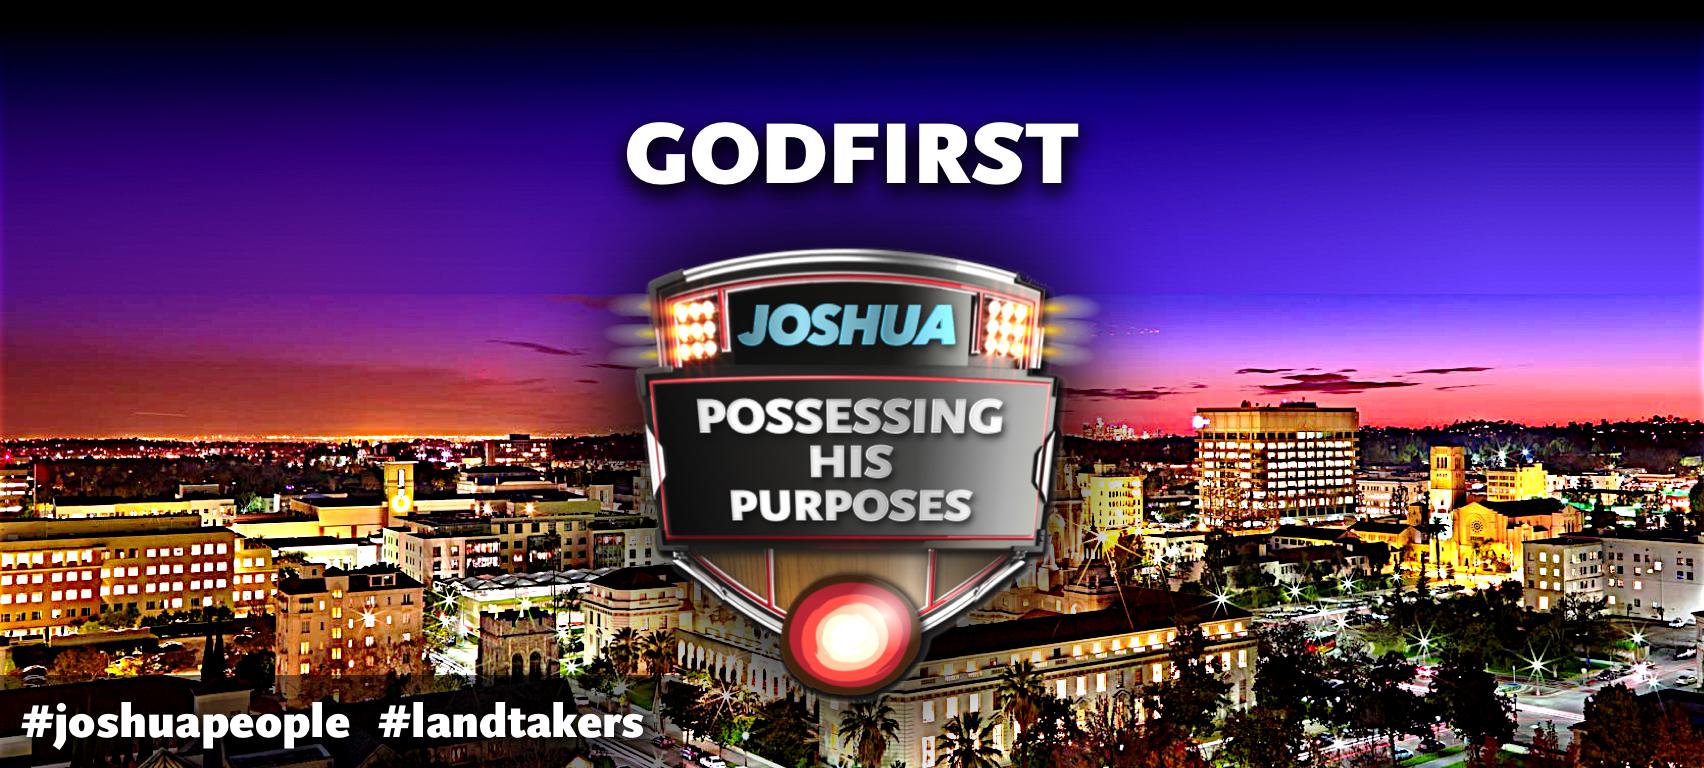 10.4.2015 Joshua _ #GodFirst.001.jpg